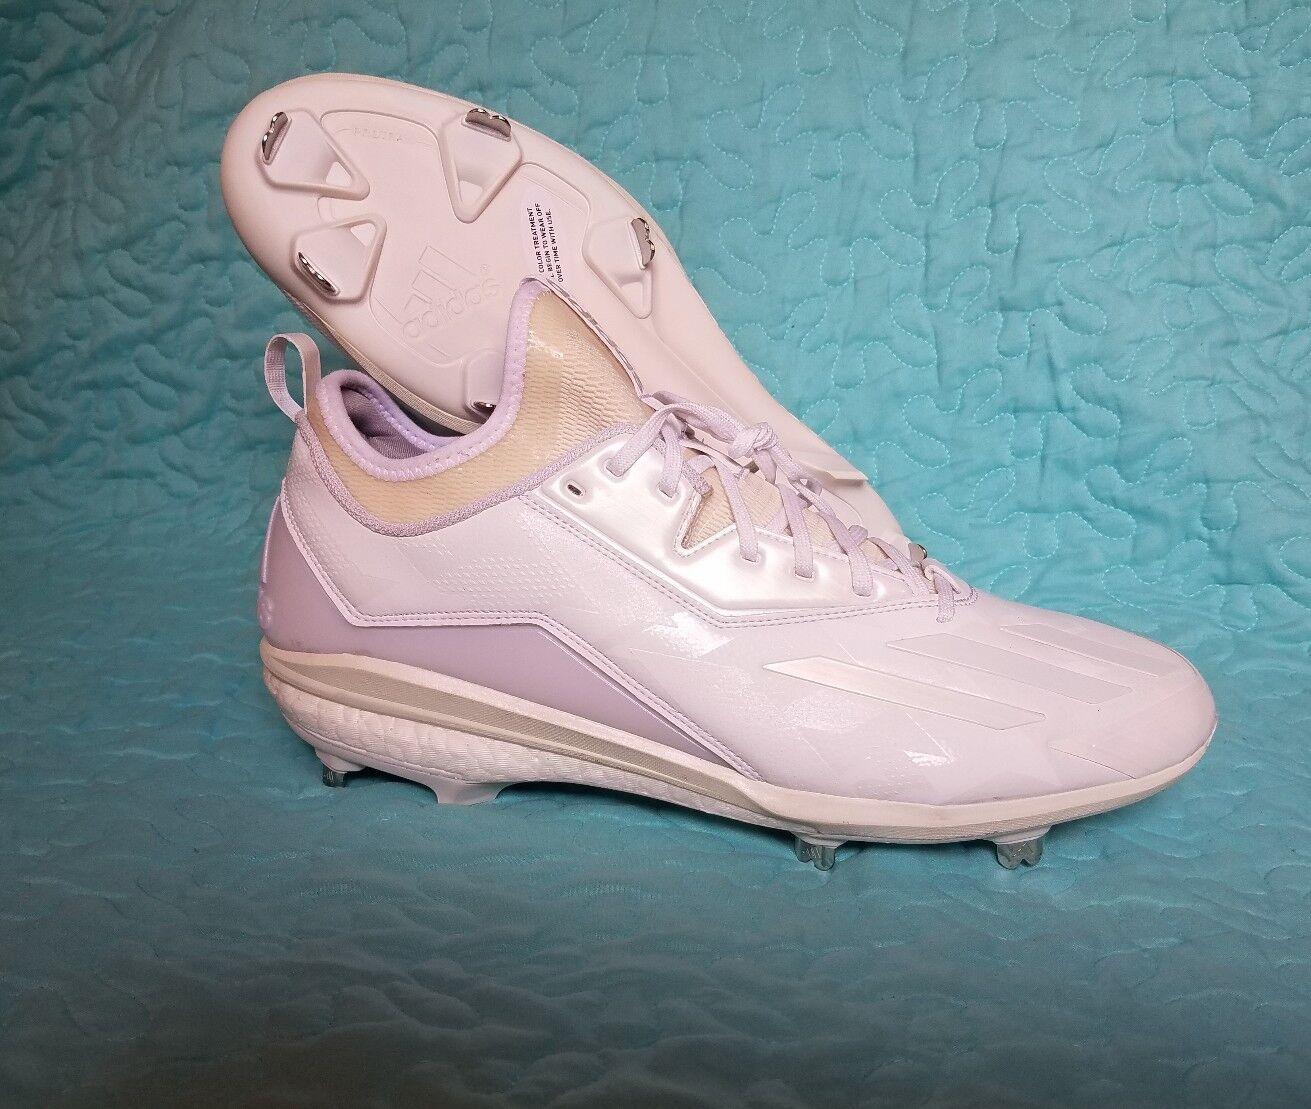 Adidas Boost Icon 2.0 Men's Baseball Cleats - Cloud White Silver Metallic B27499